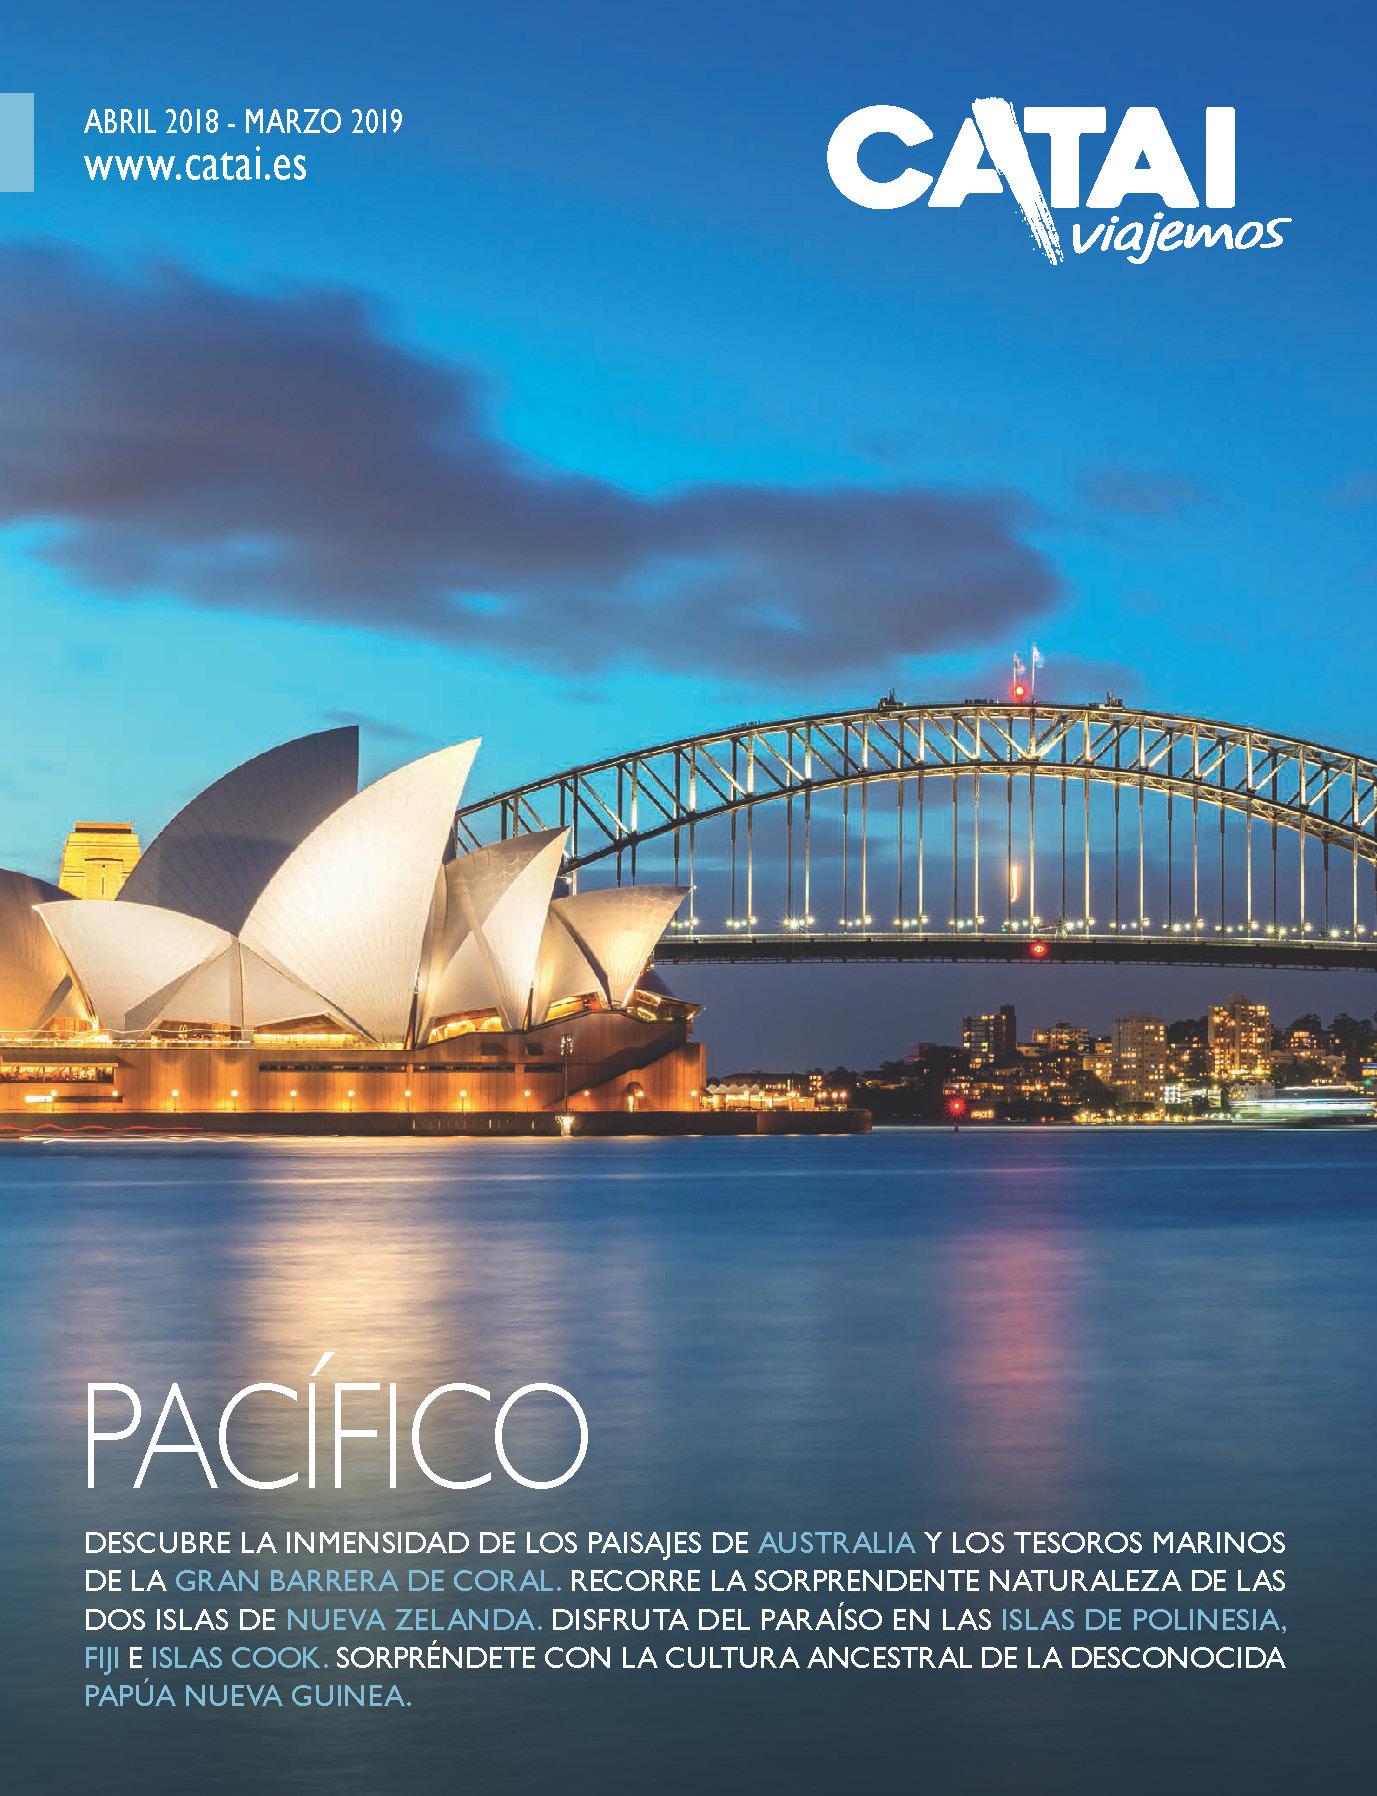 Catalogo Catai Tours Pacifico 2018-2019